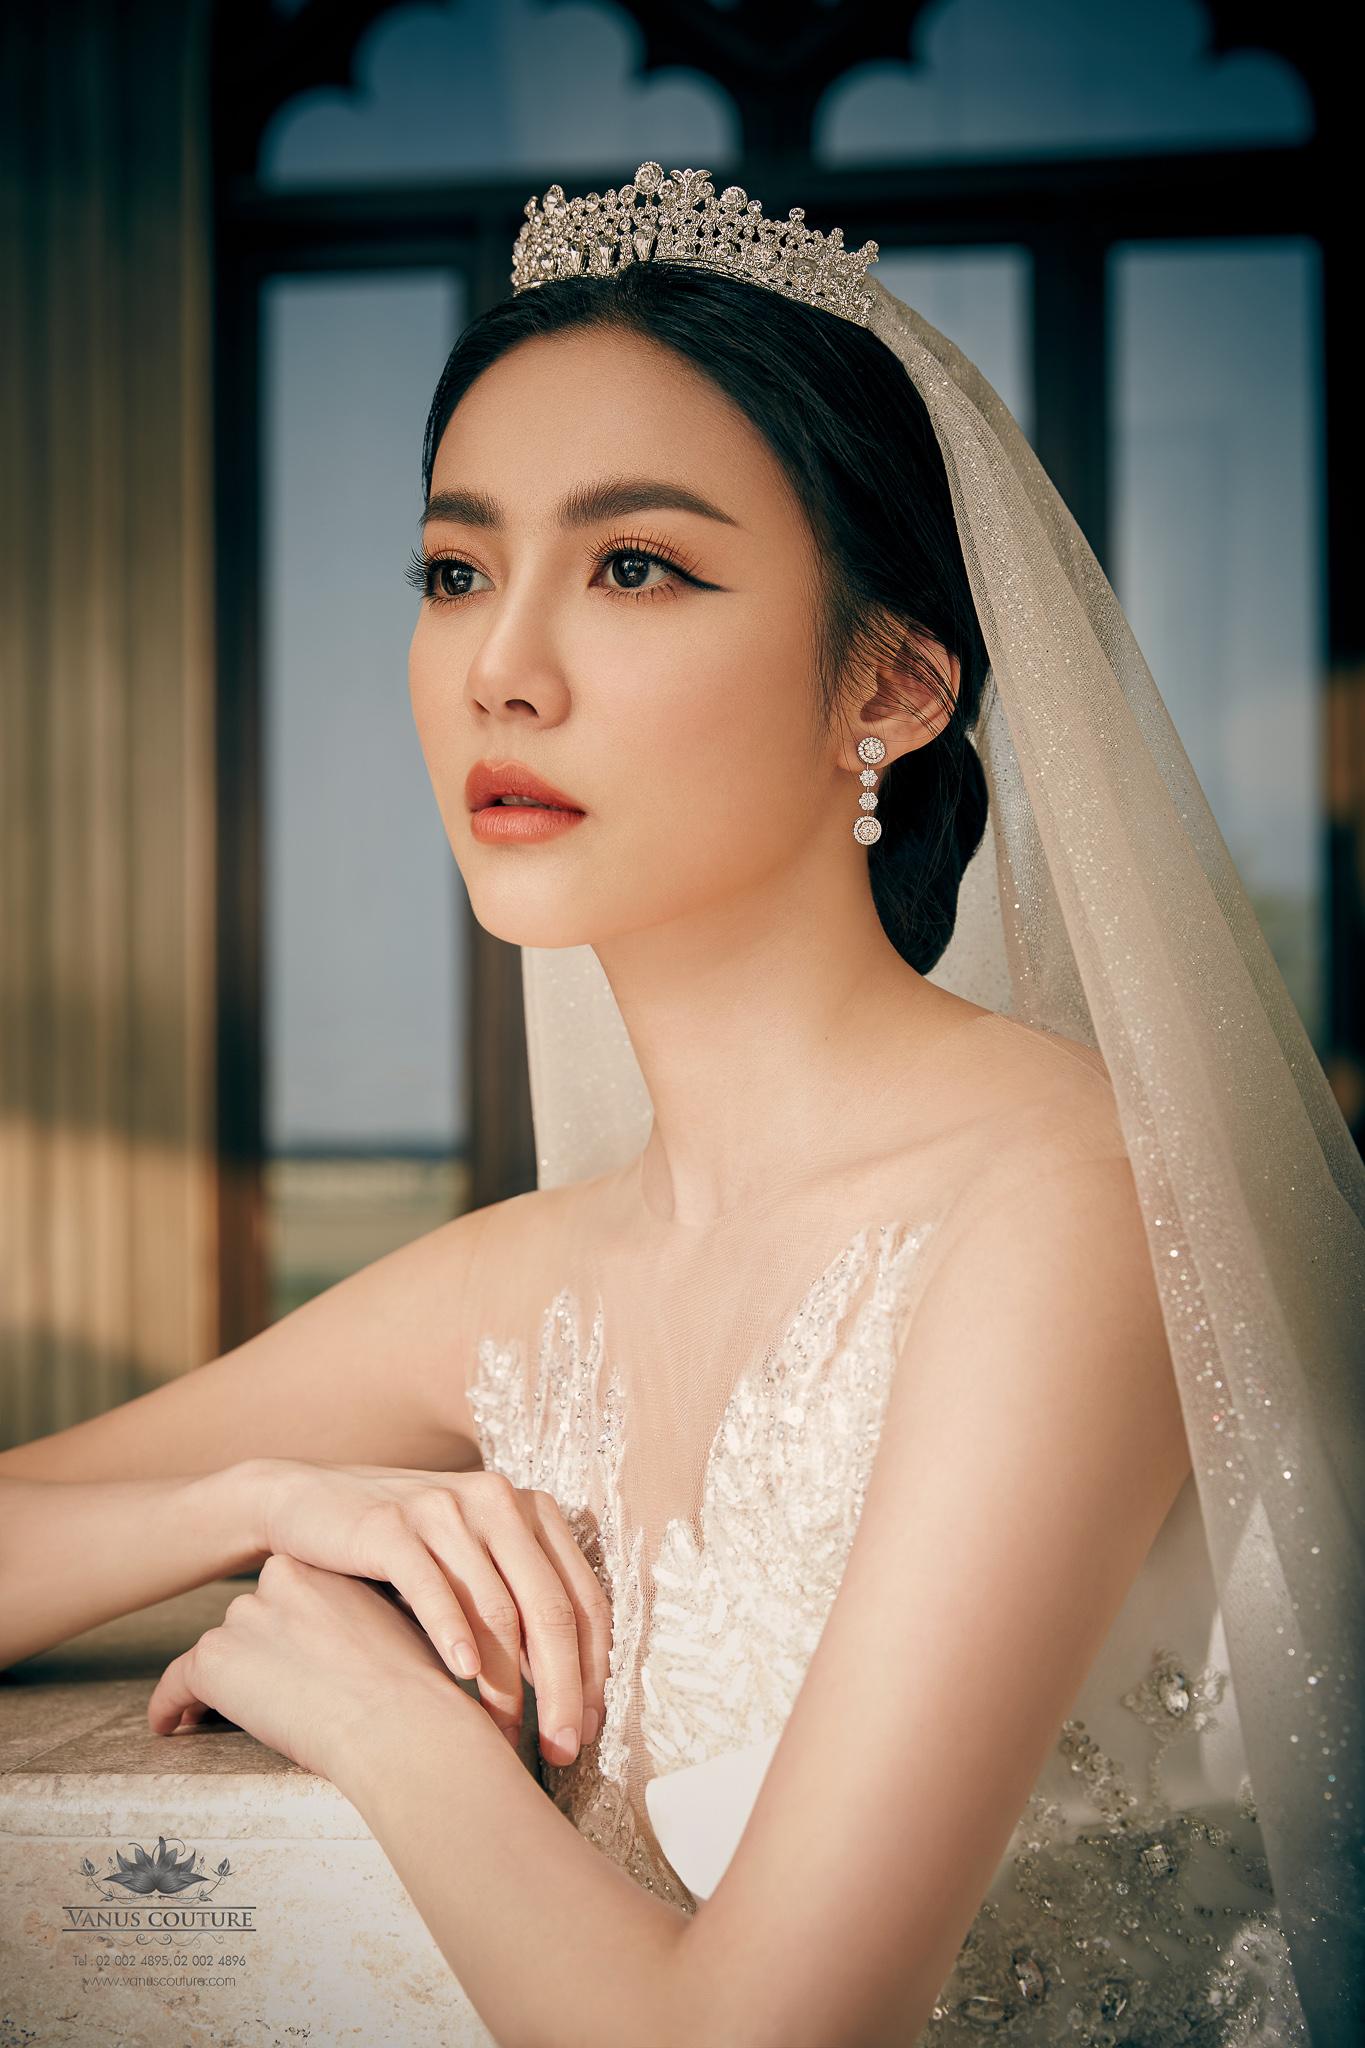 Superball wedding dress - Gybzy 05